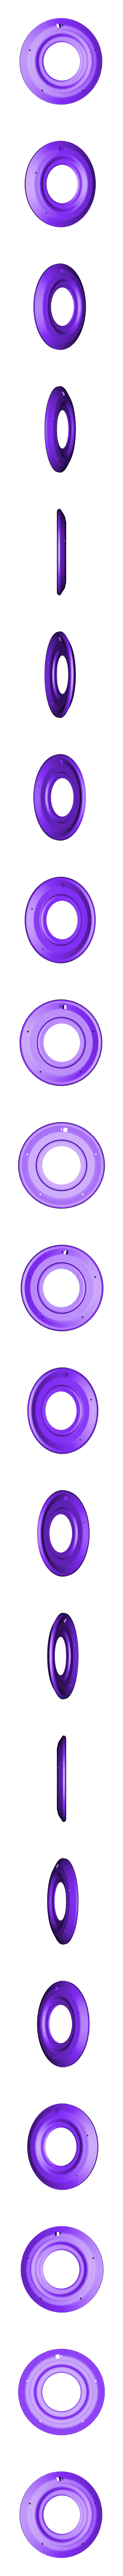 Lucio_frontFace.stl Download free STL file Overwatch Lucio Blaster • 3D printer object, Adafruit